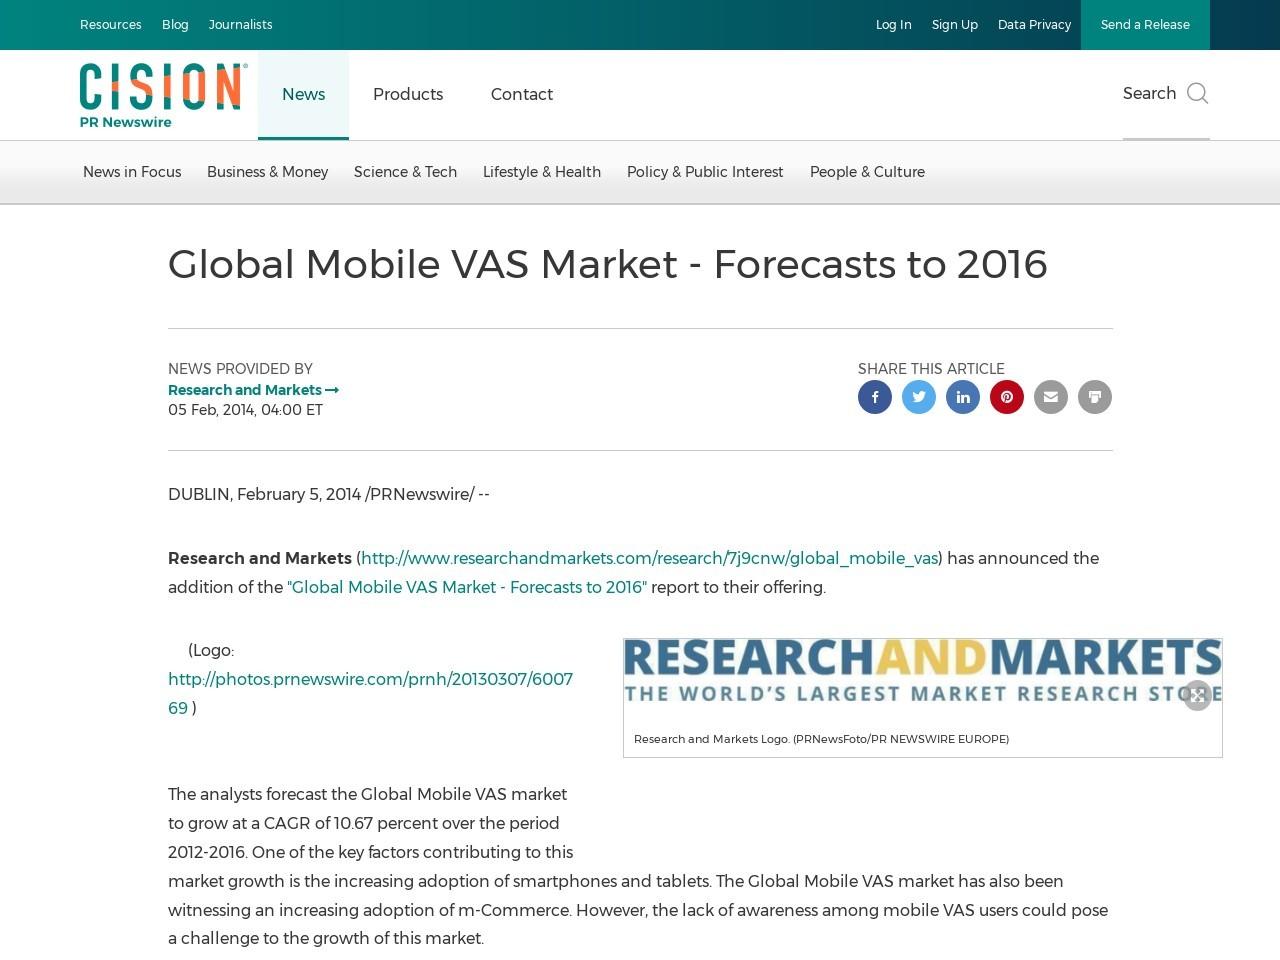 Global Mobile VAS Market – Forecasts to 2016